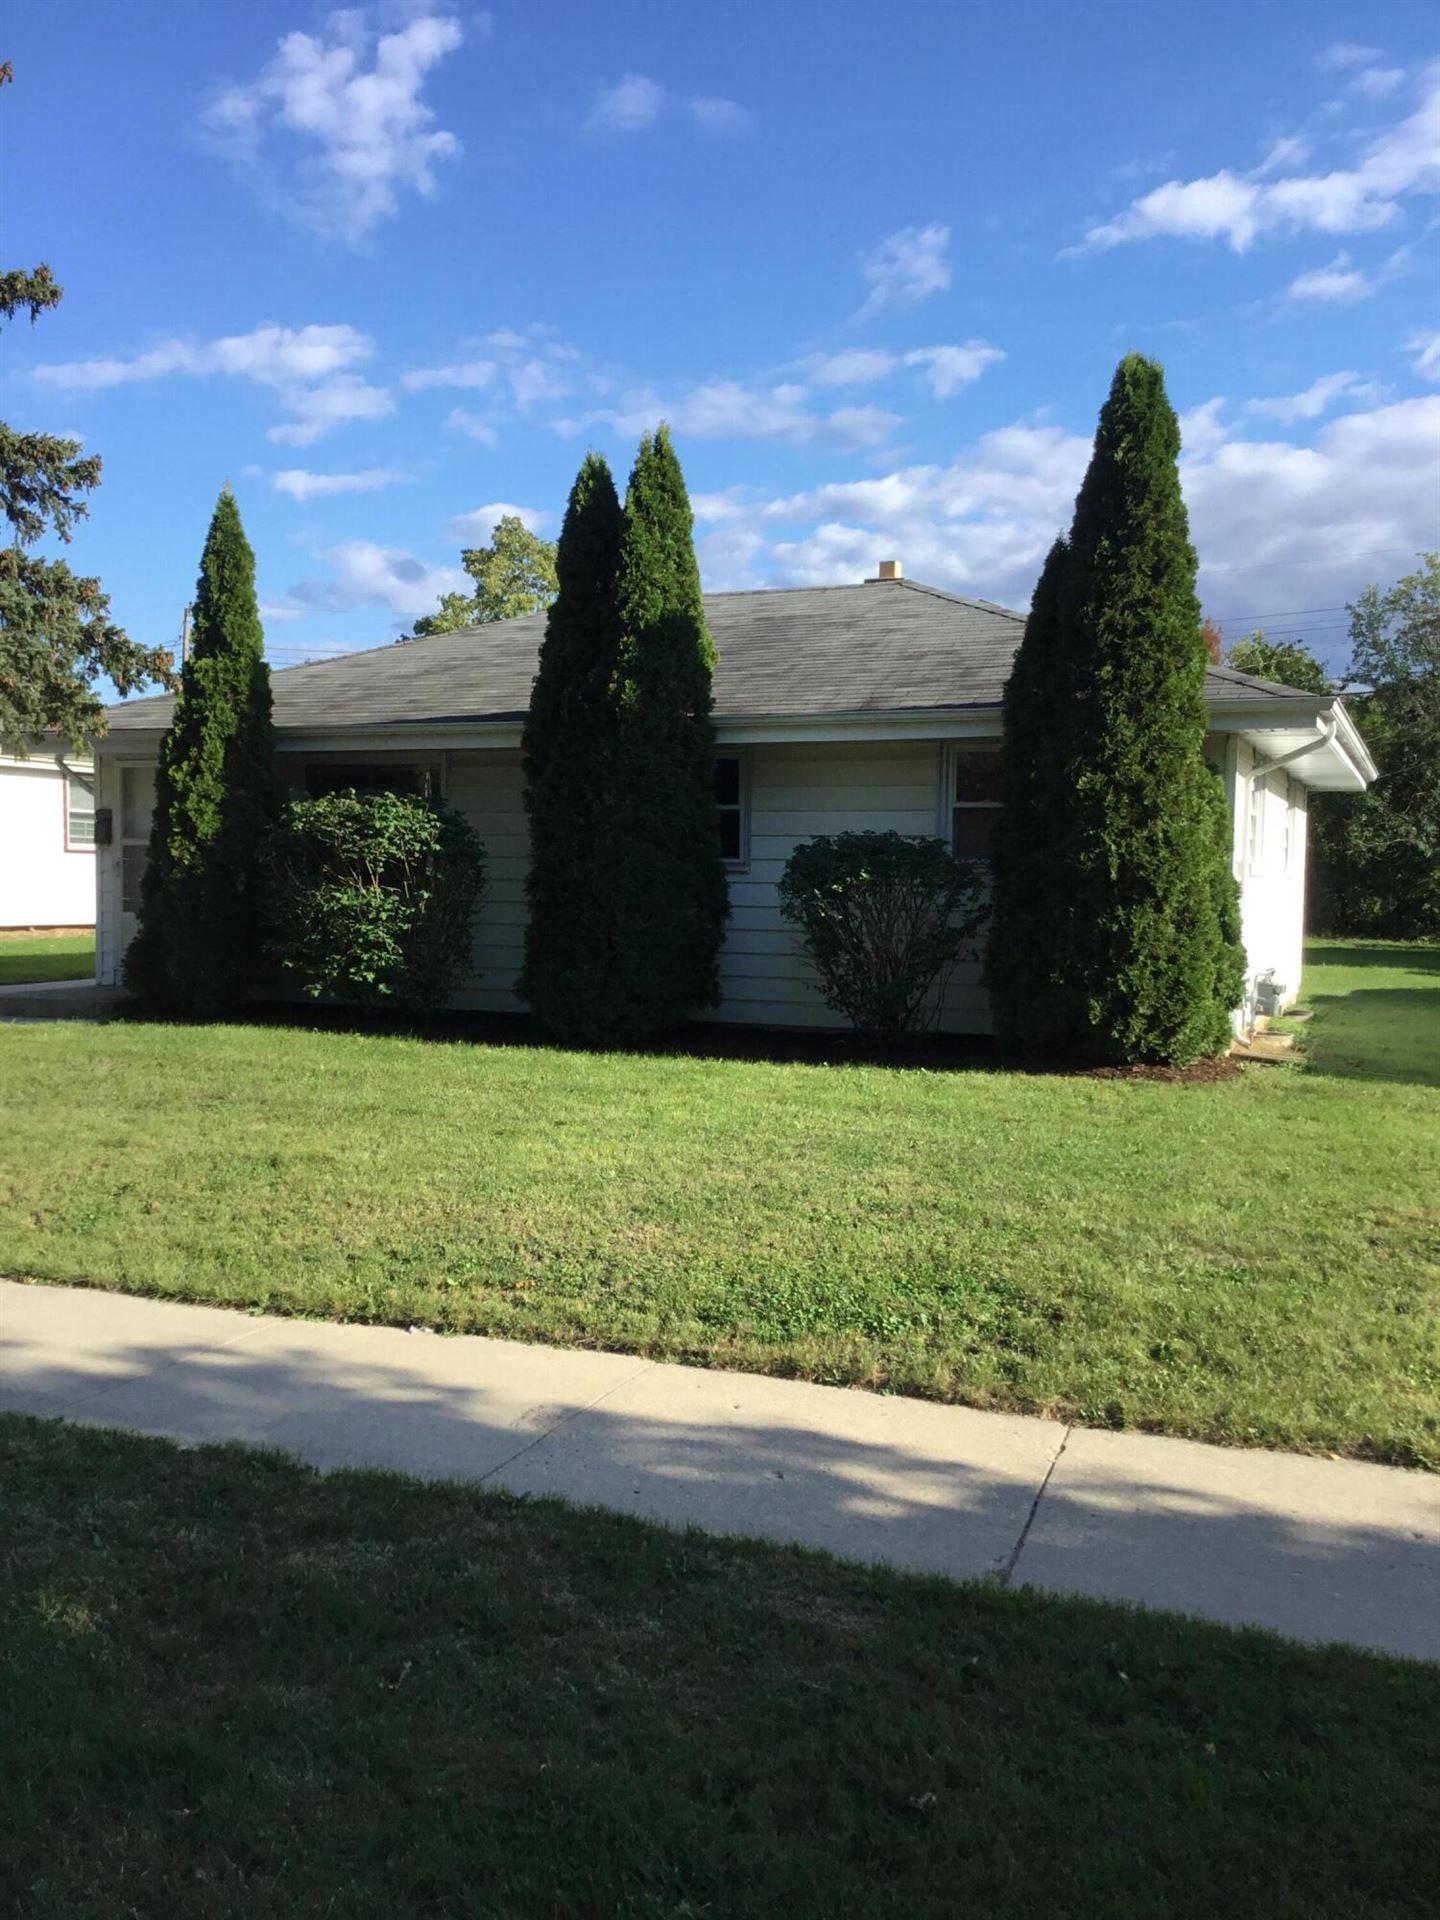 8213 W Green Tree Rd, Milwaukee, WI 53223 - #: 1763703